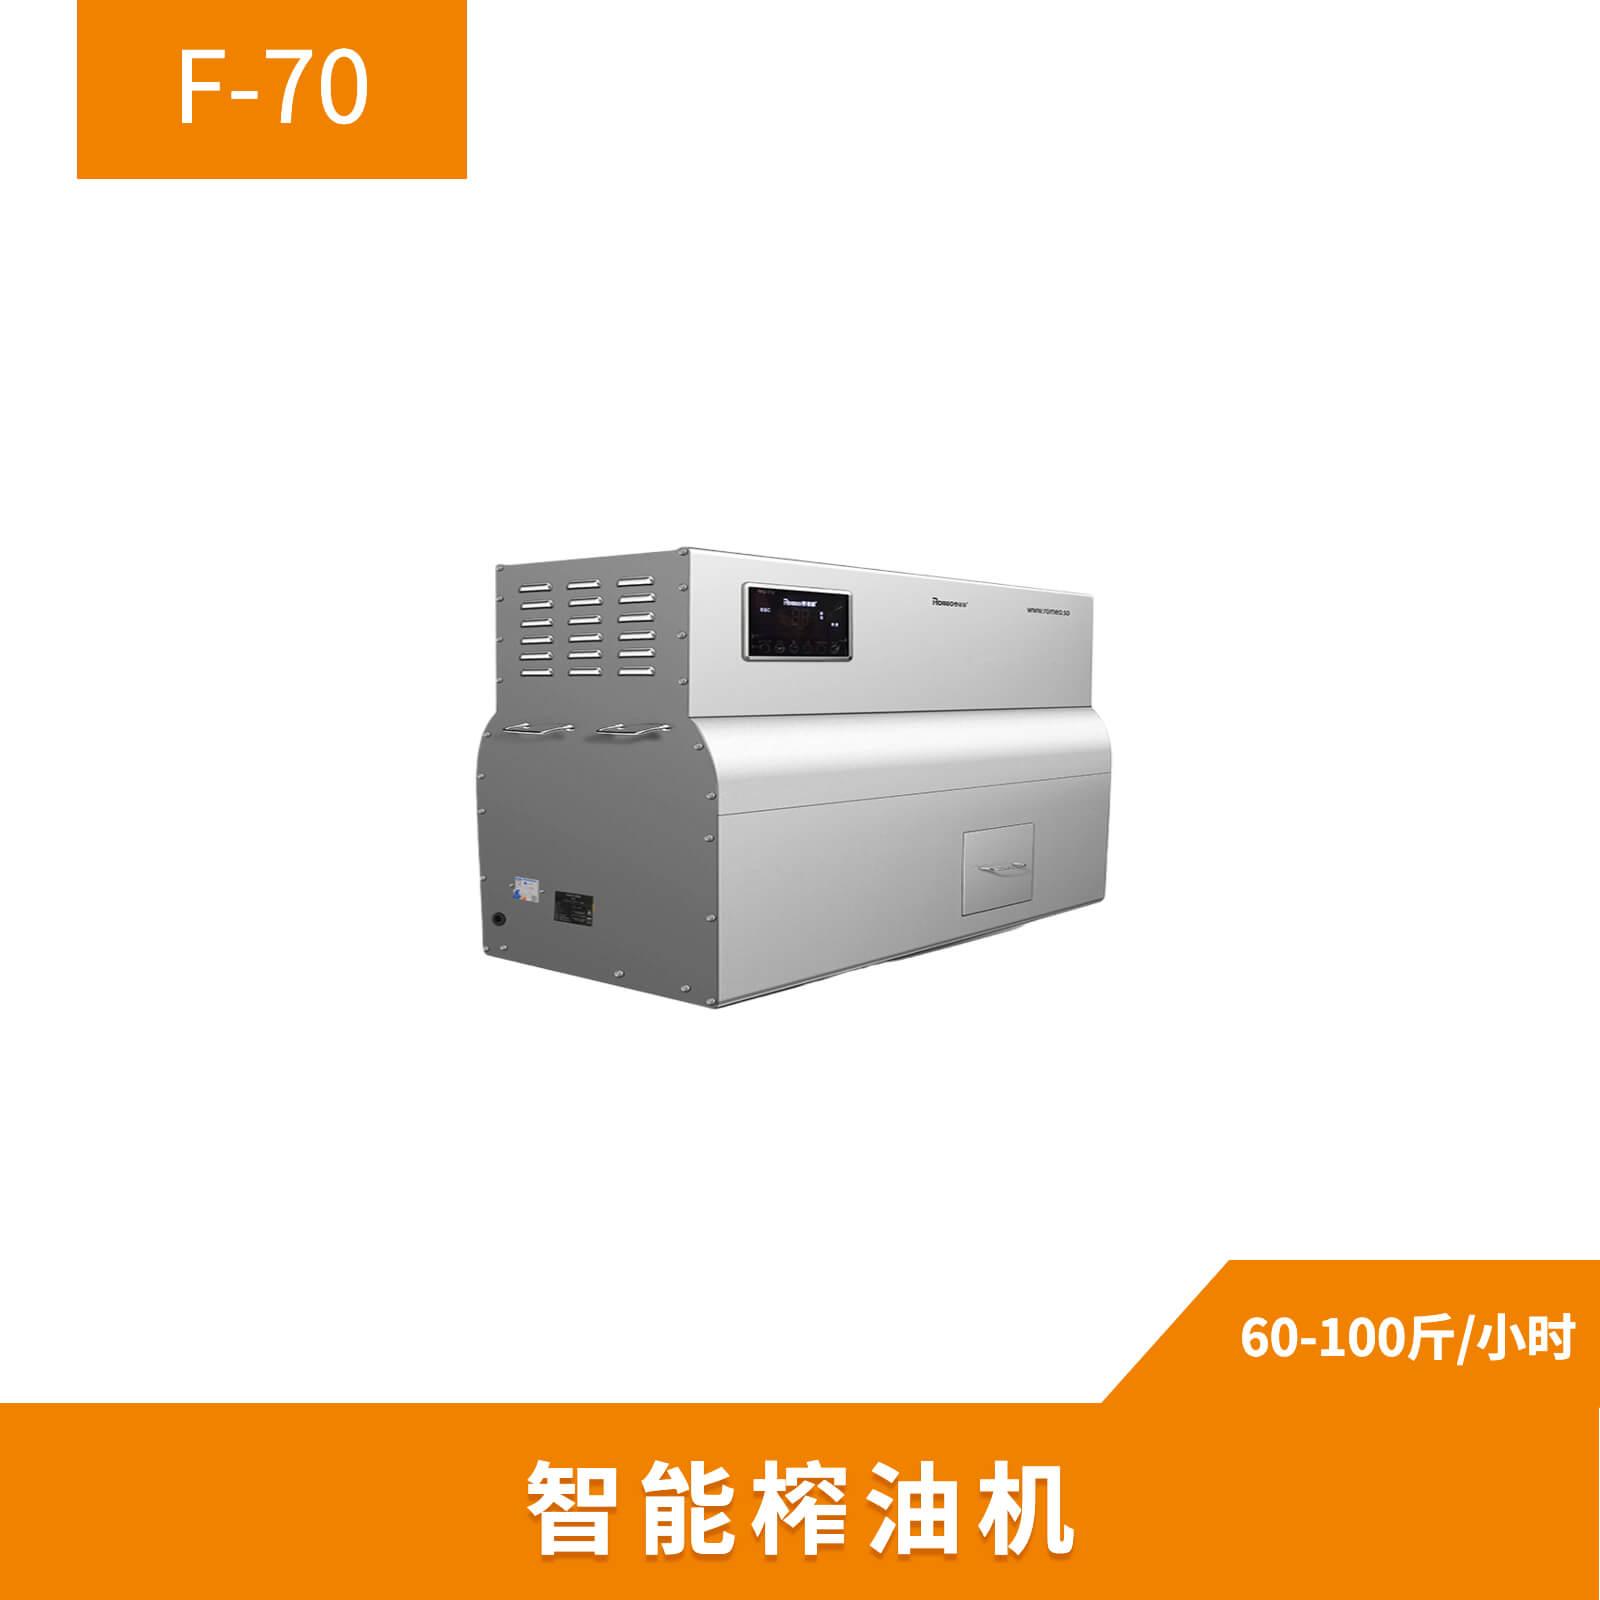 智能榨油机F-70